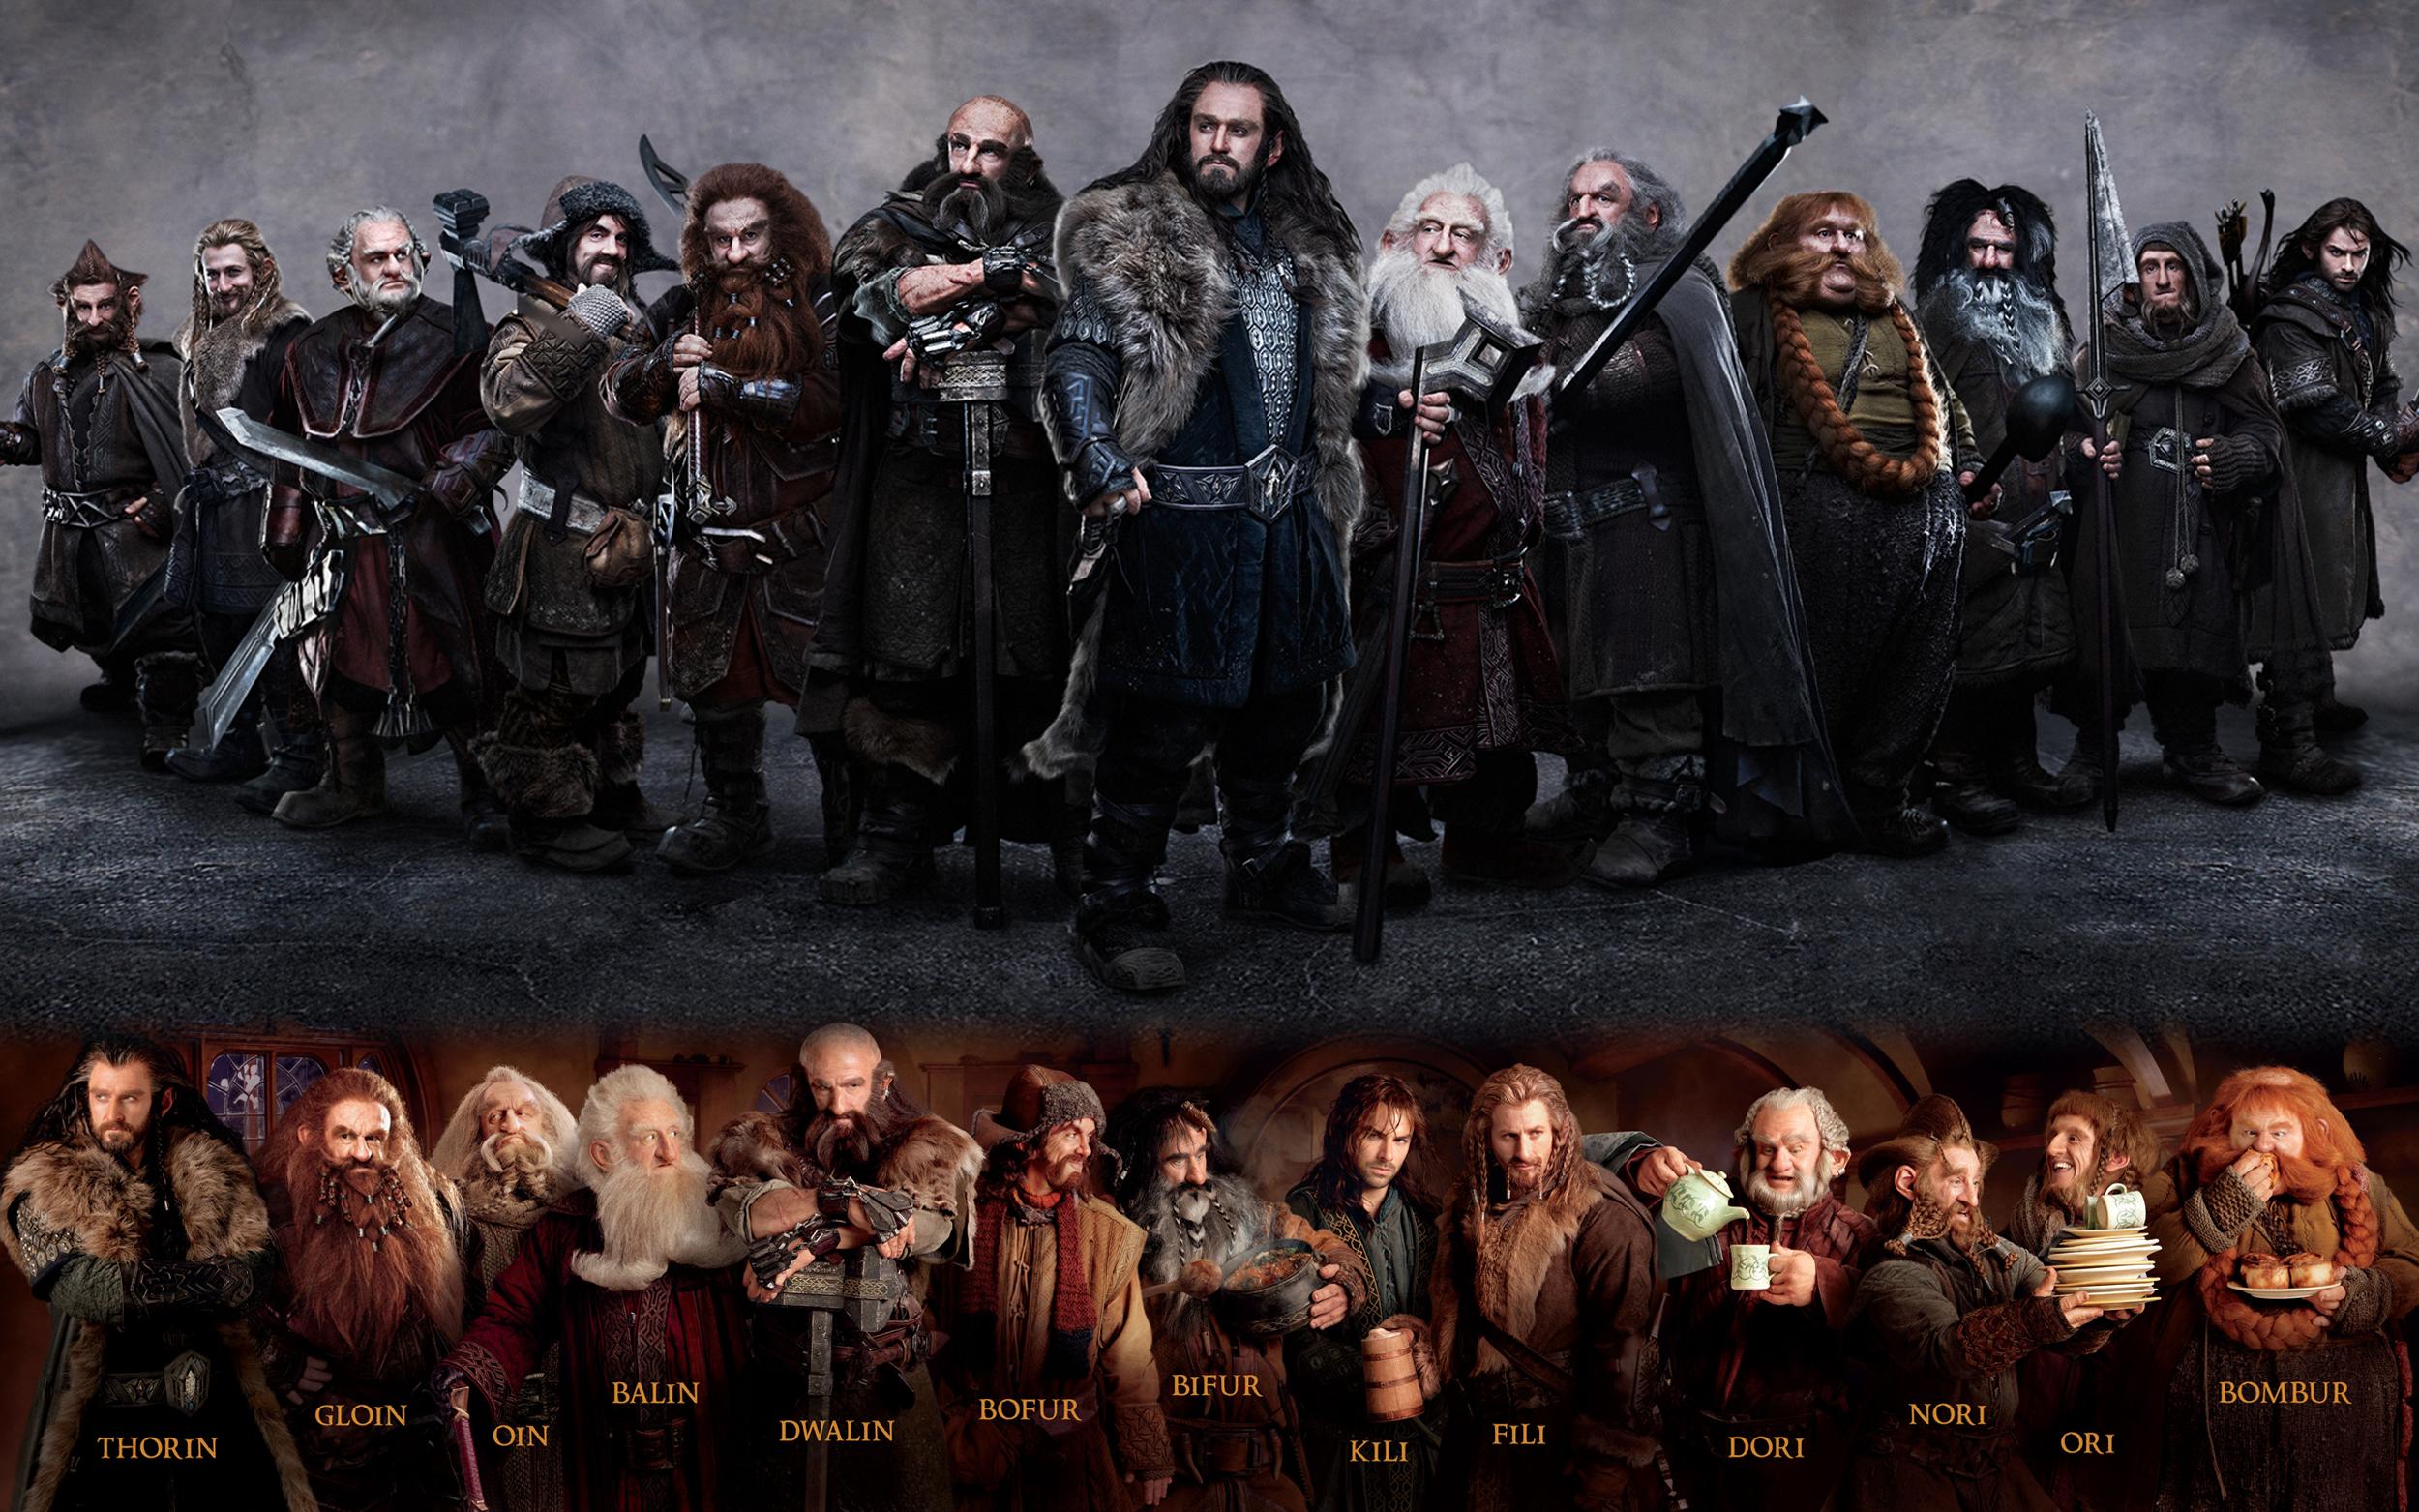 Hobbit wallpaper by movie2kaza 2500x1563